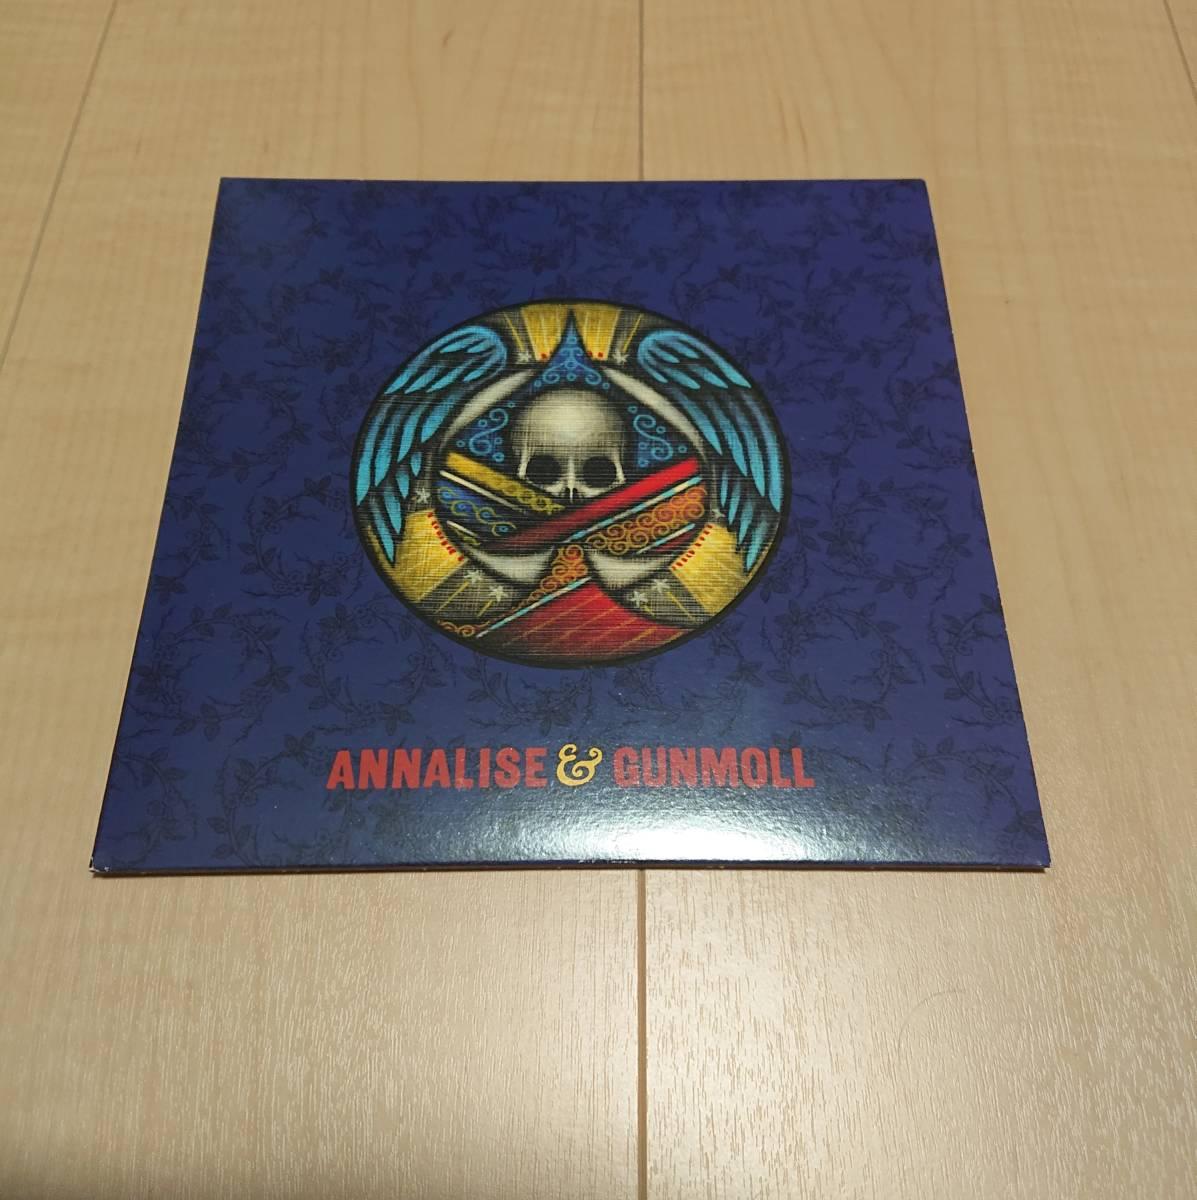 【Annalise / Gunmoll Split】navel skimmer identity travis cut leatherfece snuffy smile